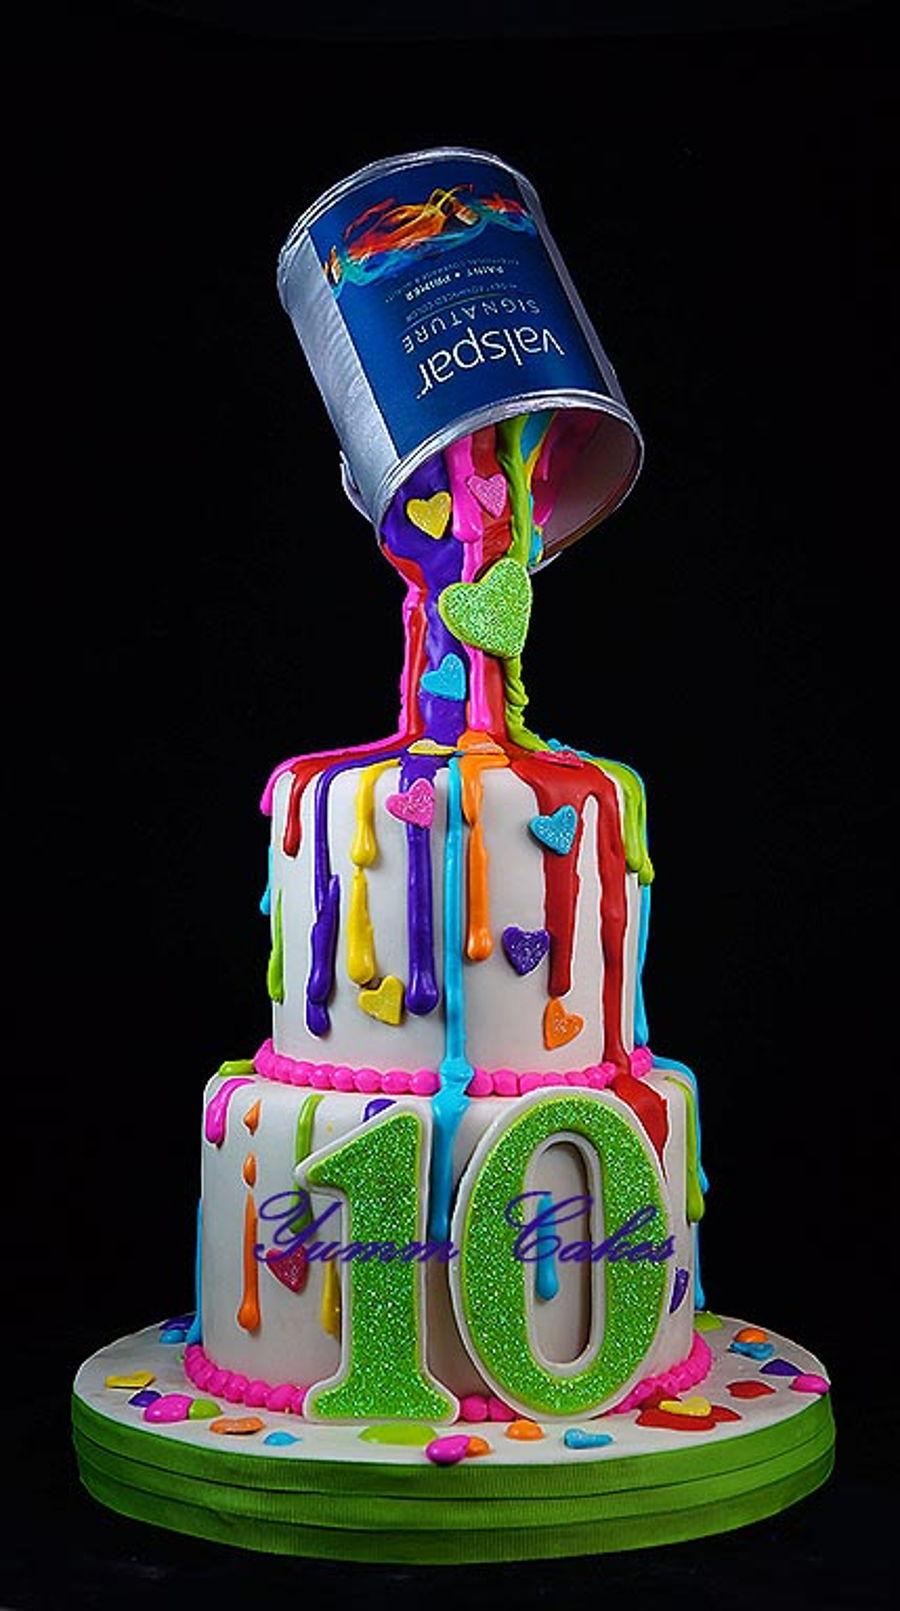 Royal Icing Drip Cake Cakecentral Com